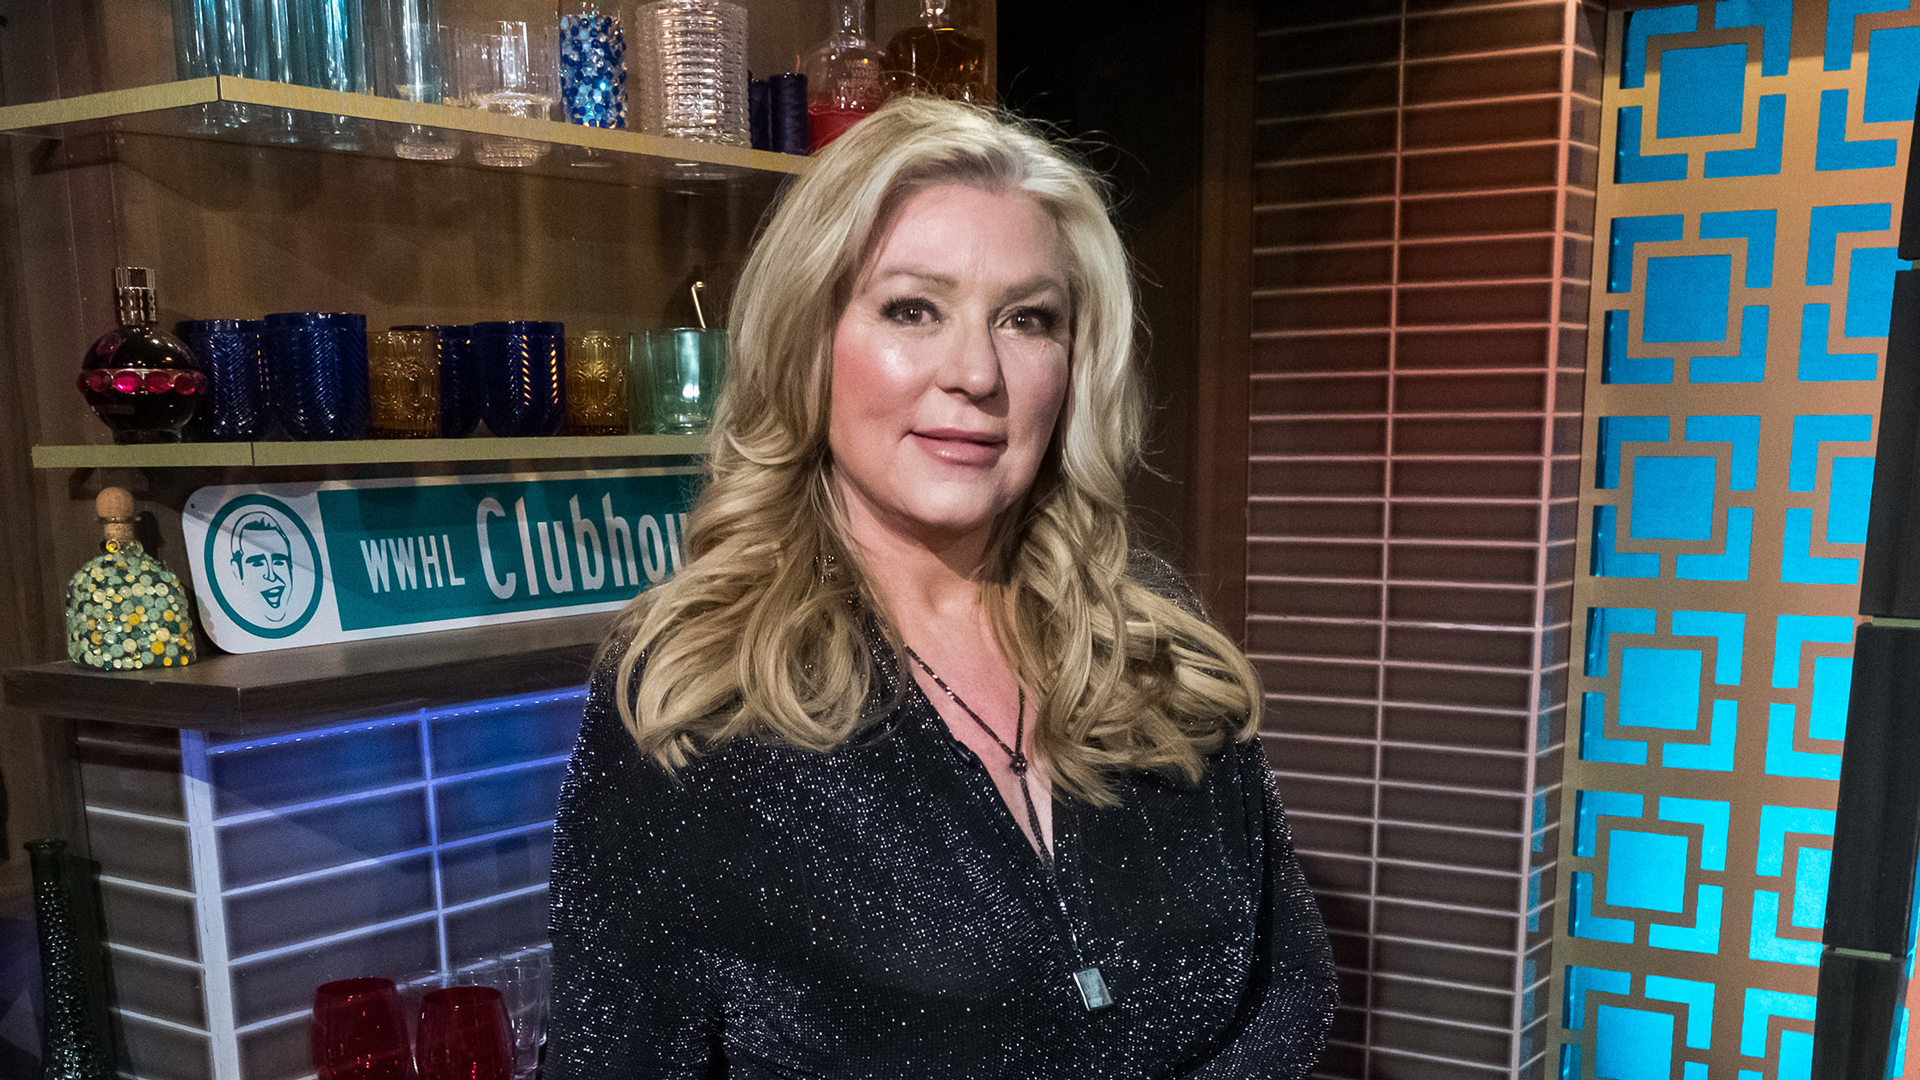 How Debra Newell Survived an Abusive Marriage to John 'Dirty John' Meehan